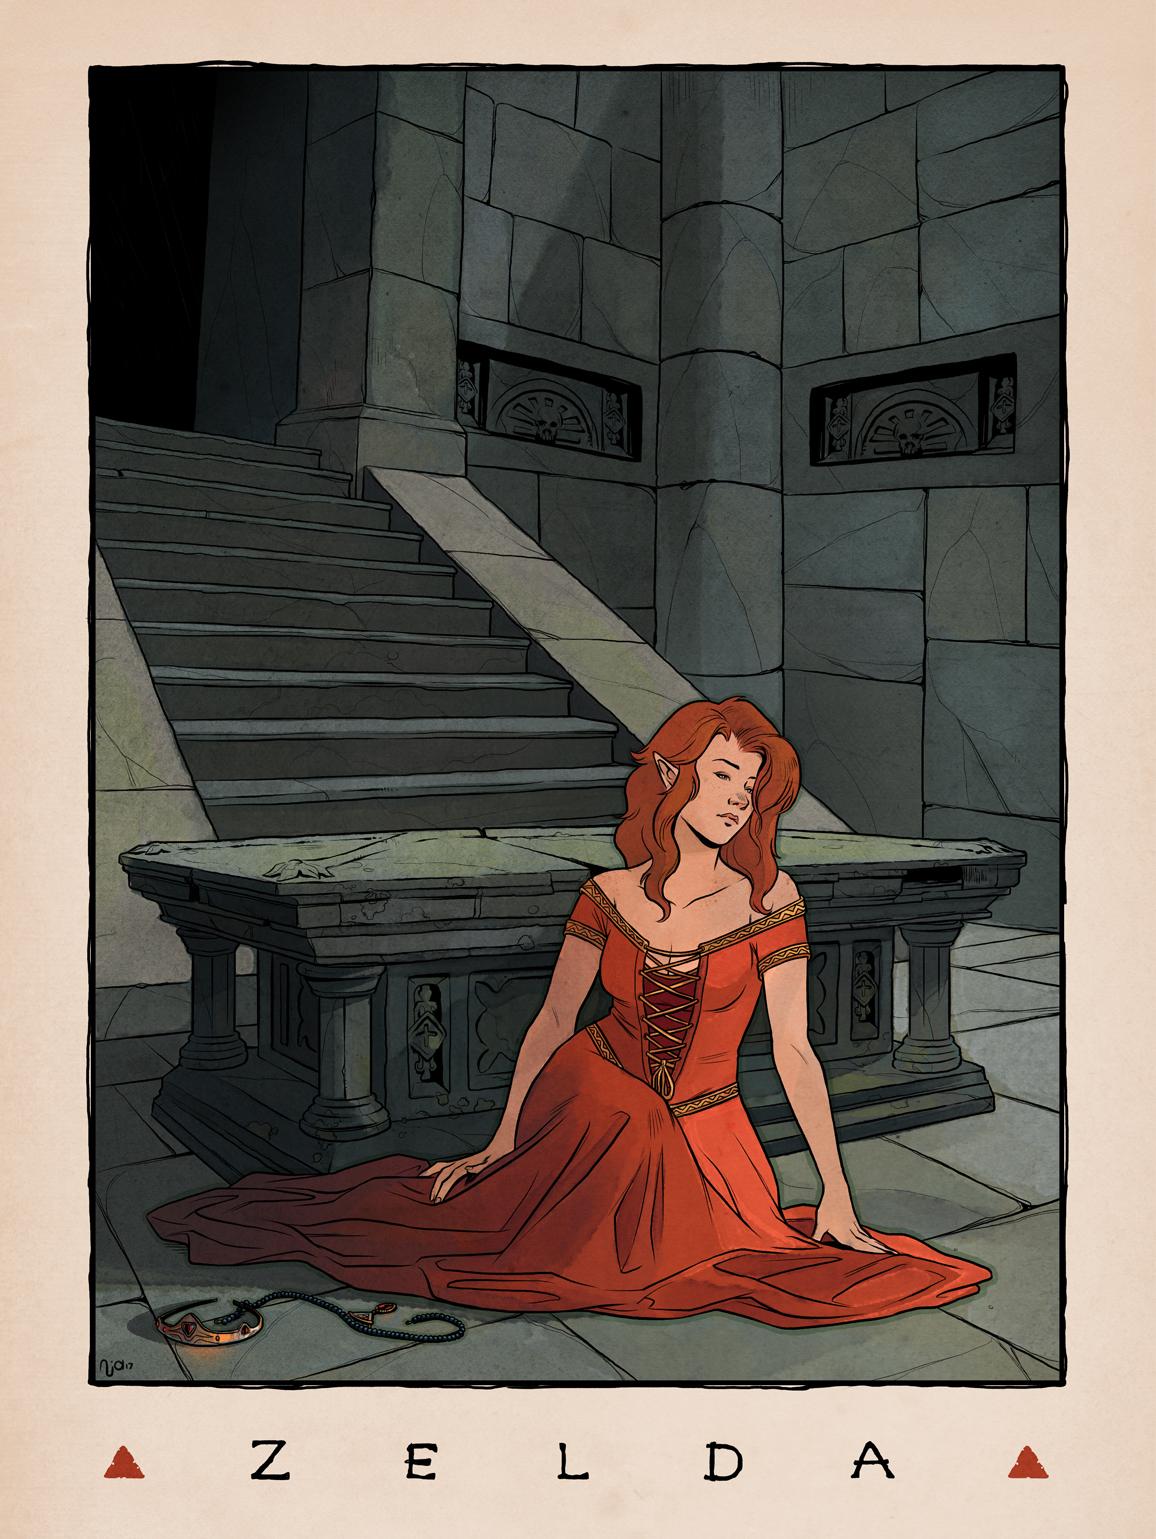 LOZ Redux: Princess Zelda by Deimos-Remus